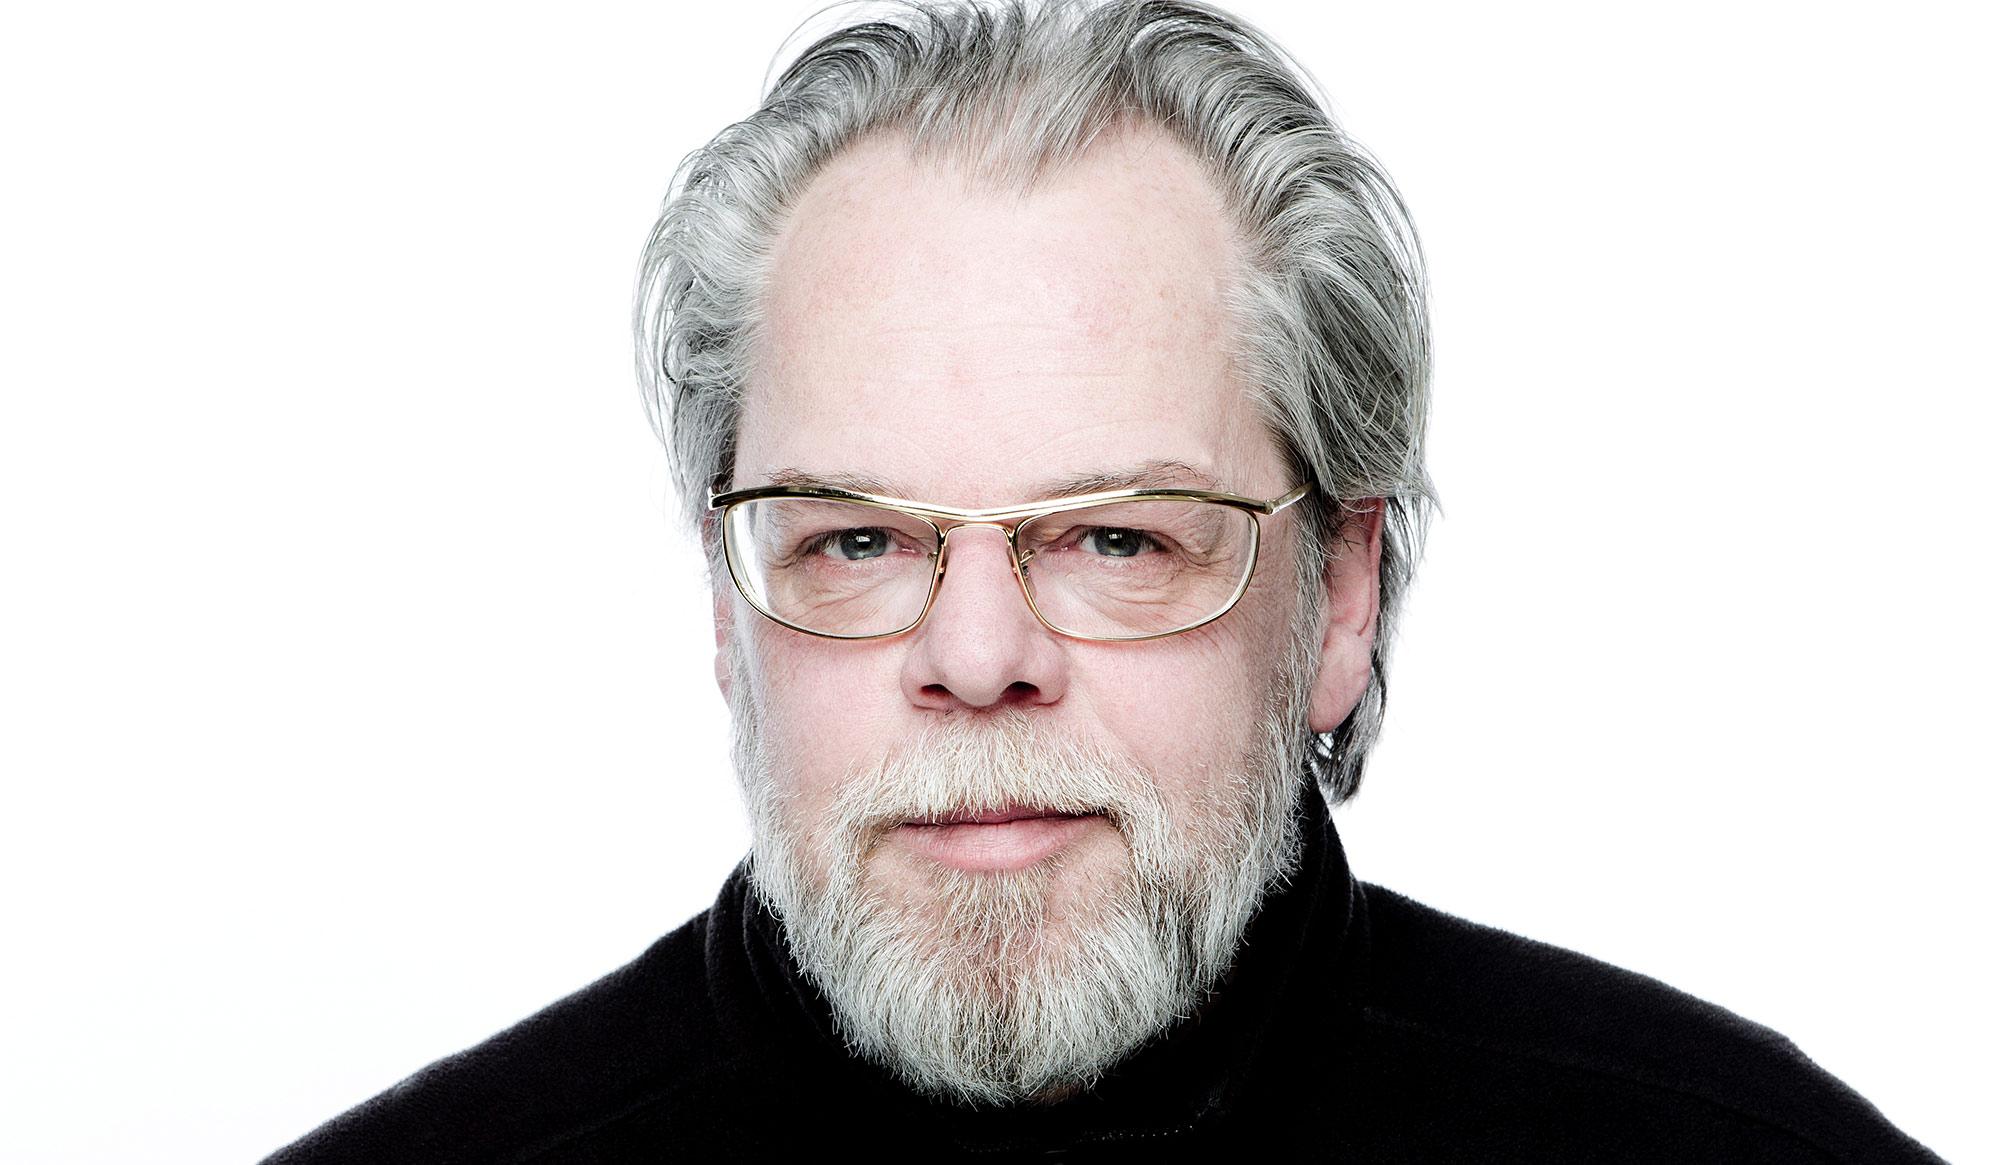 Uli Böckmann